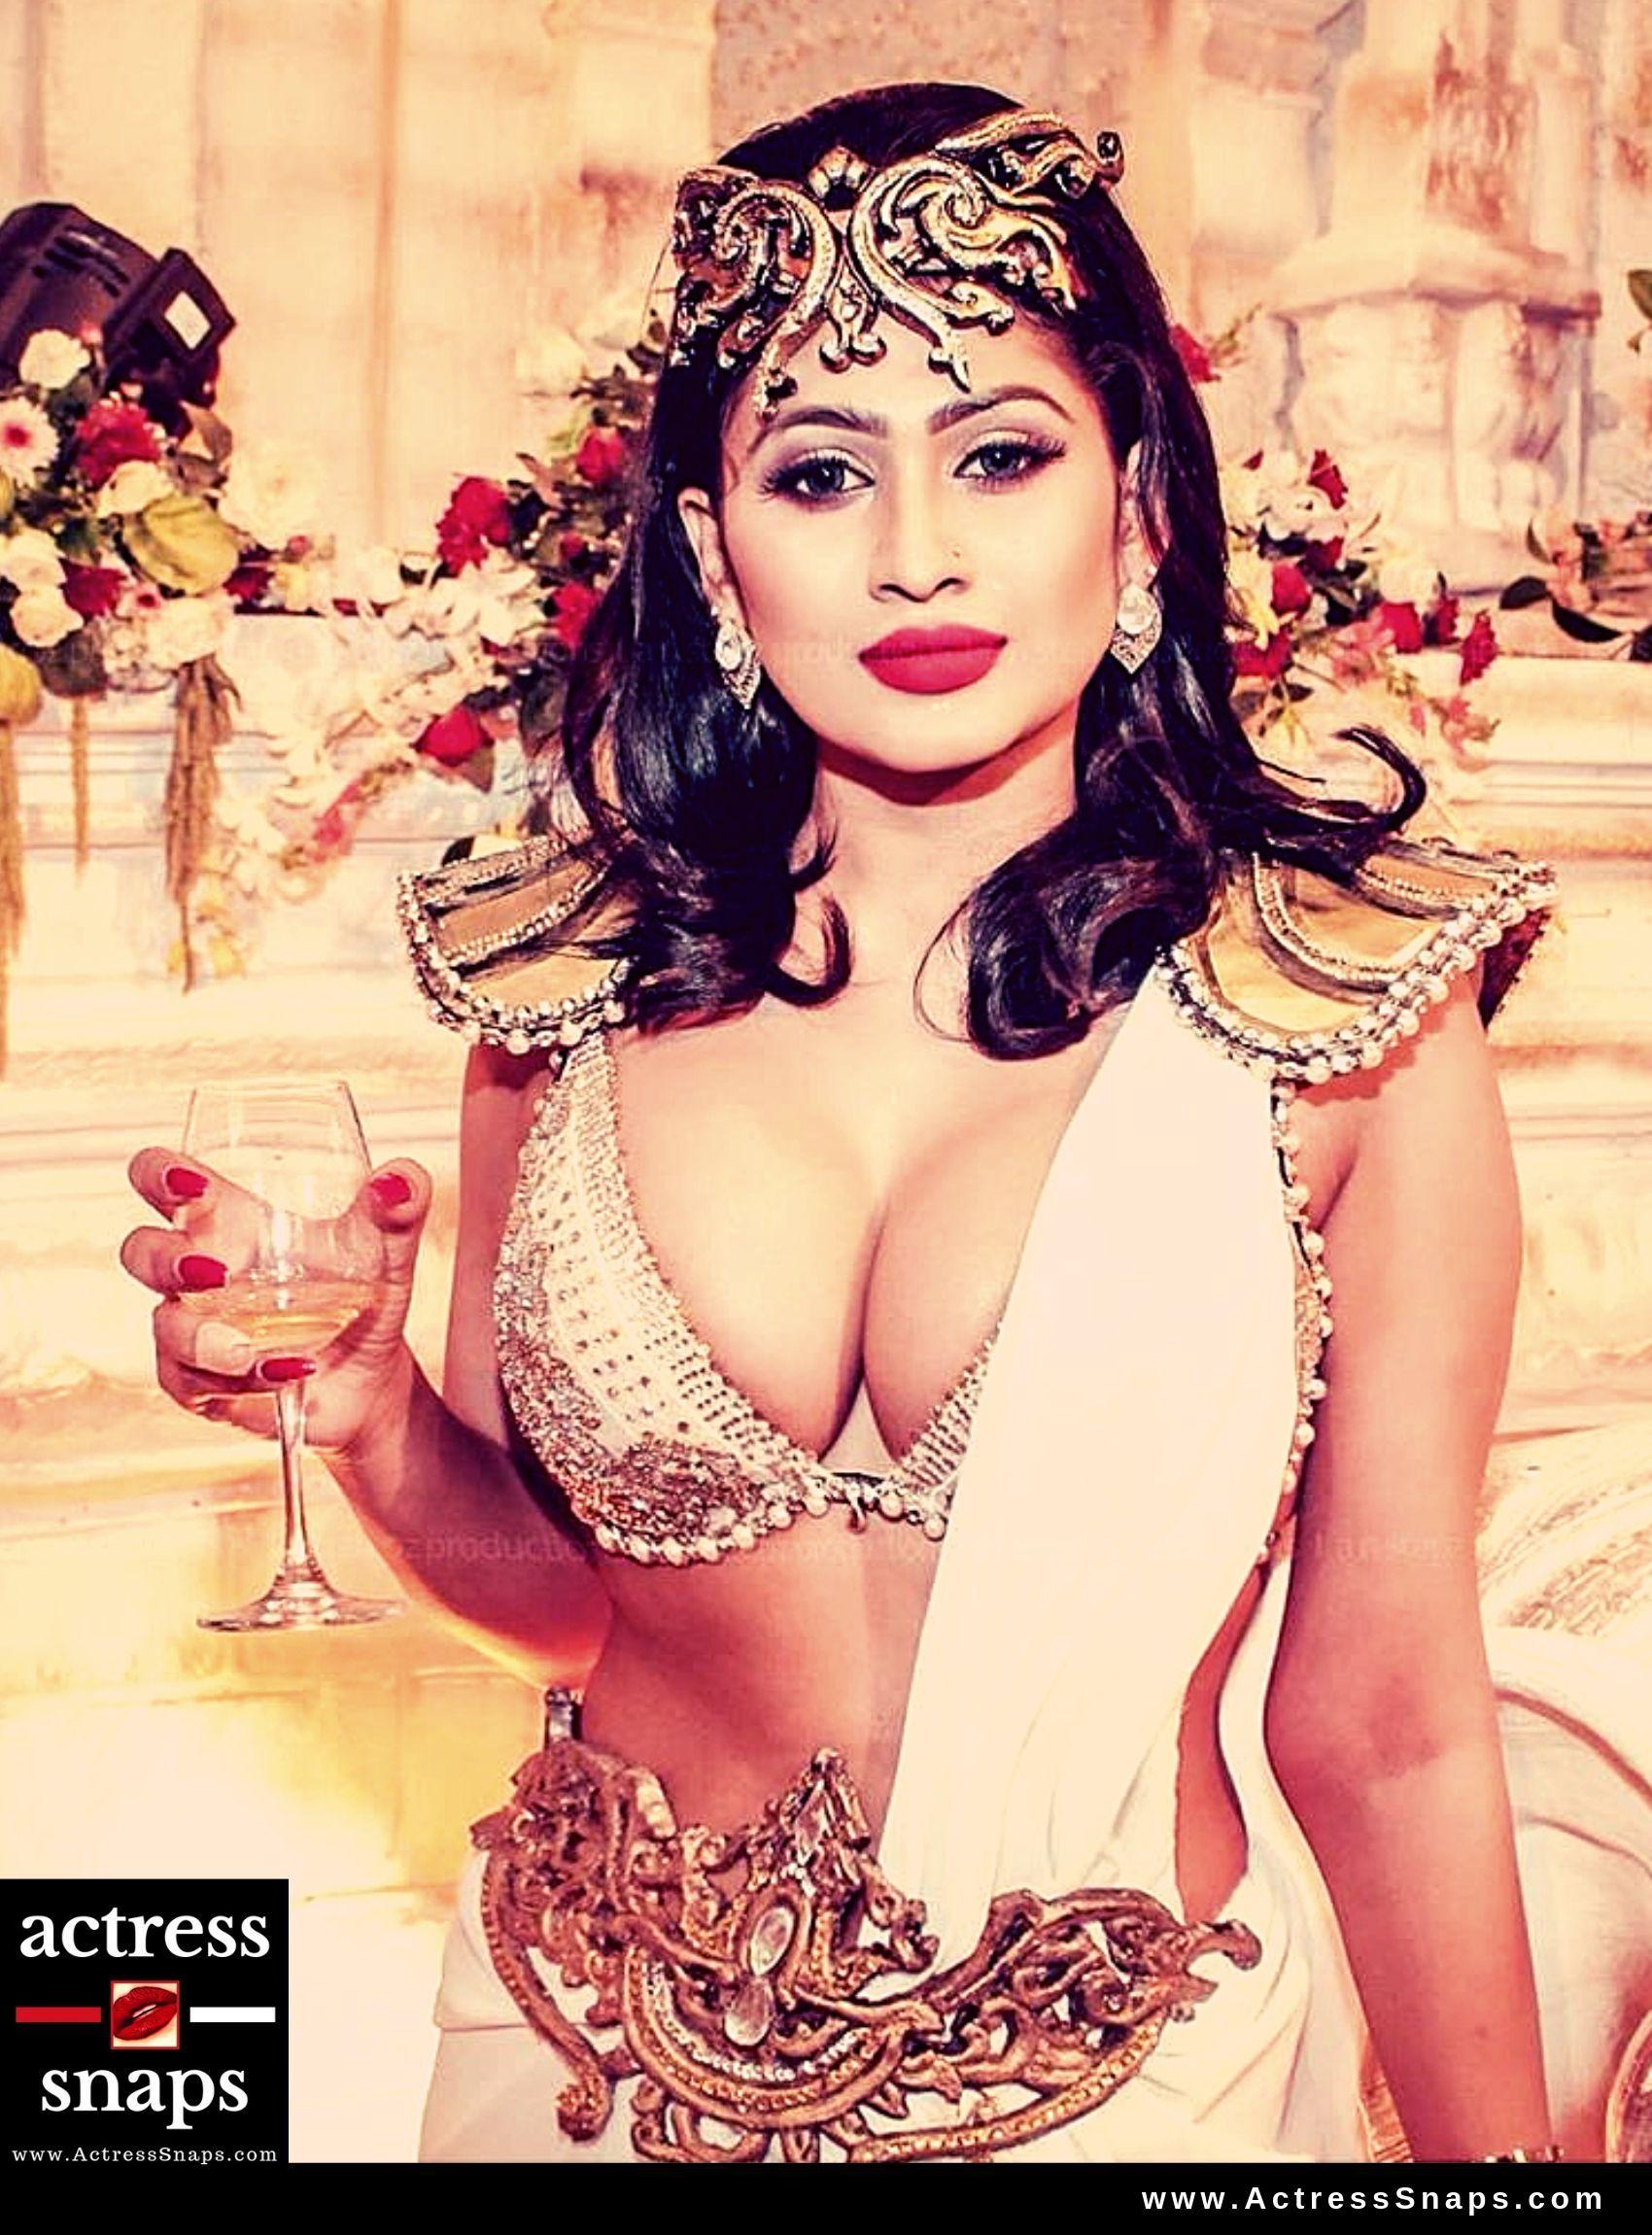 Piumi Hansamali - Sexy Photos Collection - Sexy Actress Pictures   Hot Actress Pictures - ActressSnaps.com